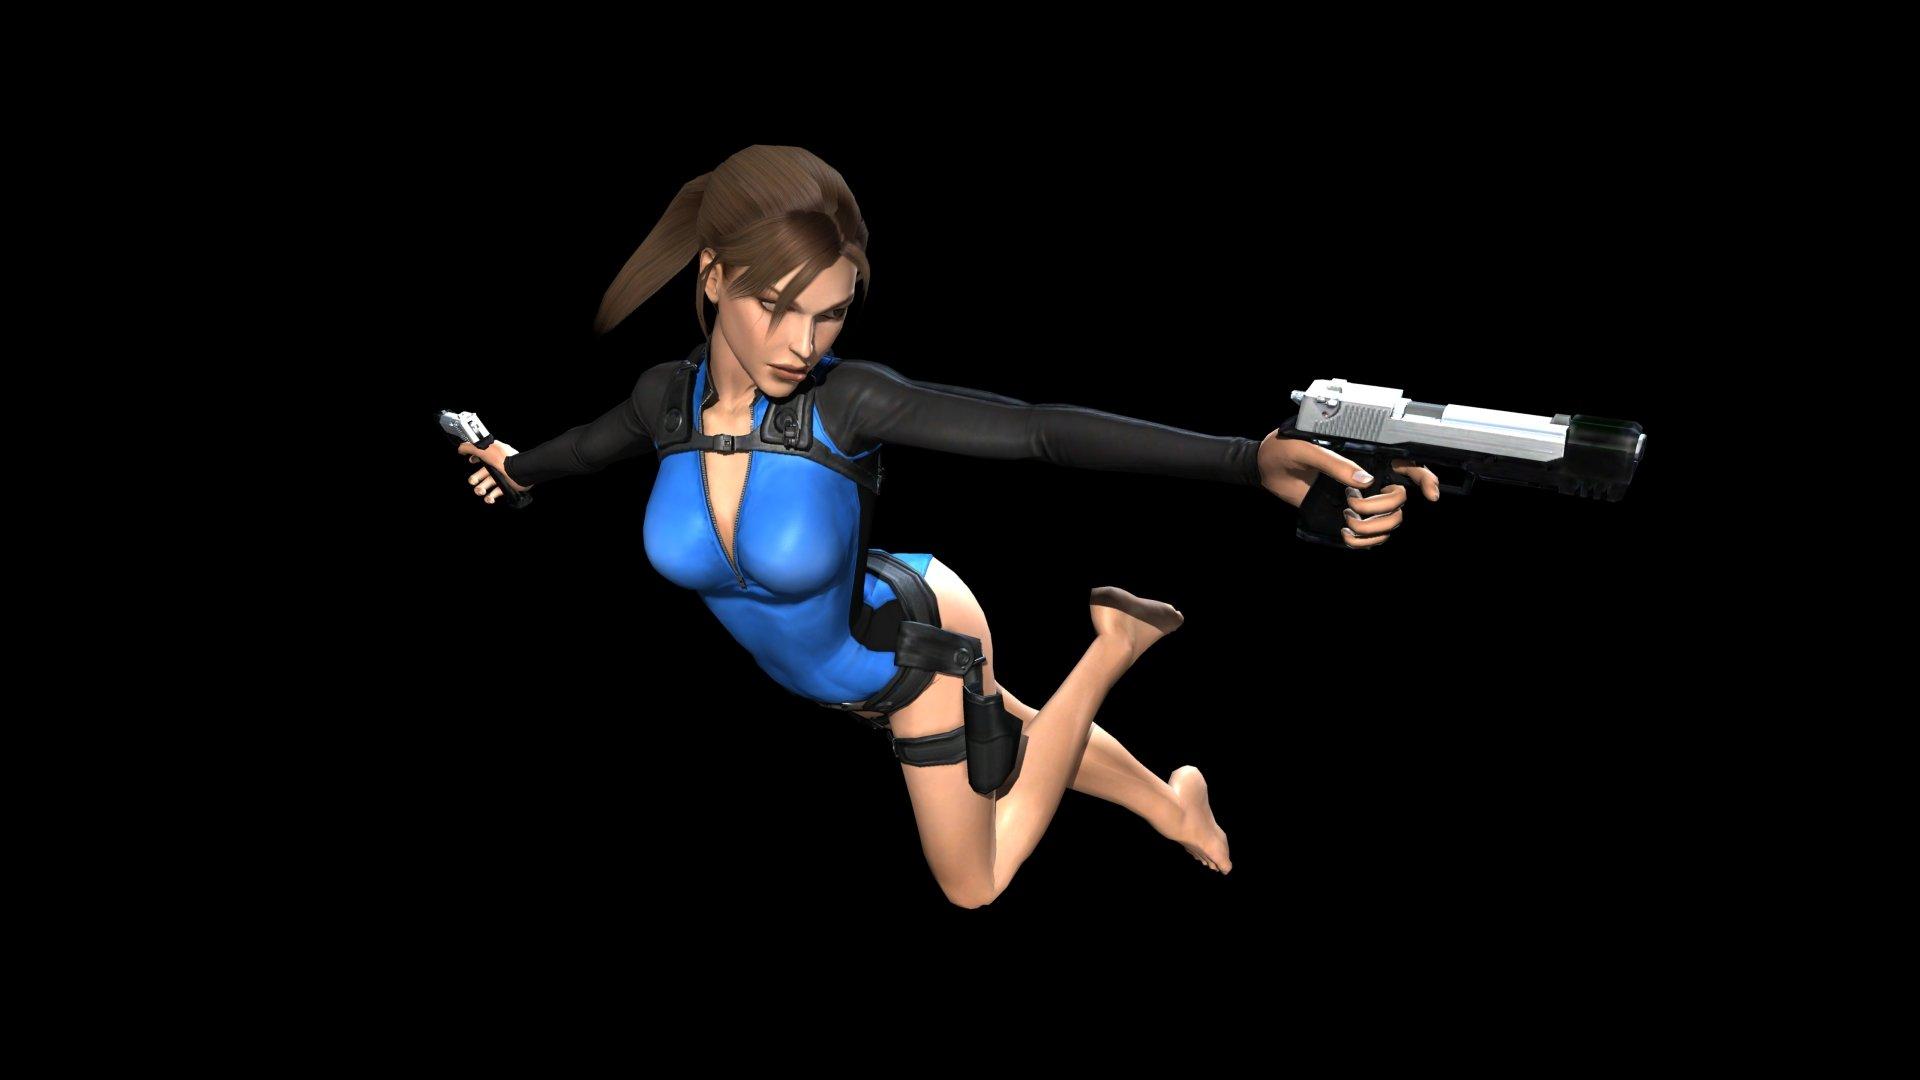 thumb-1920-466244.jpg - Tomb Raider: Underworld